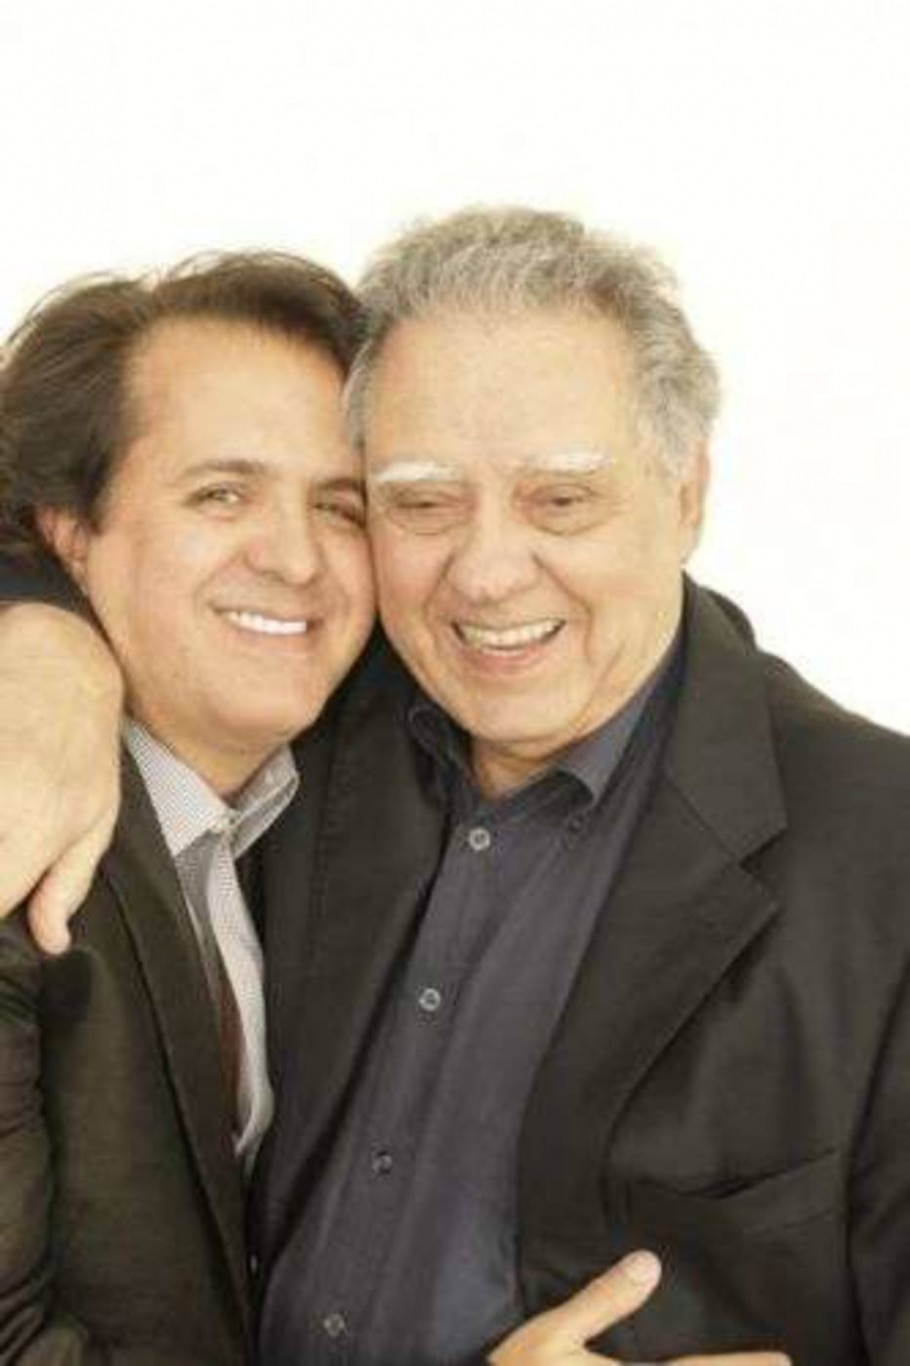 Presidente no cinema - Paulo Giandalia/AE